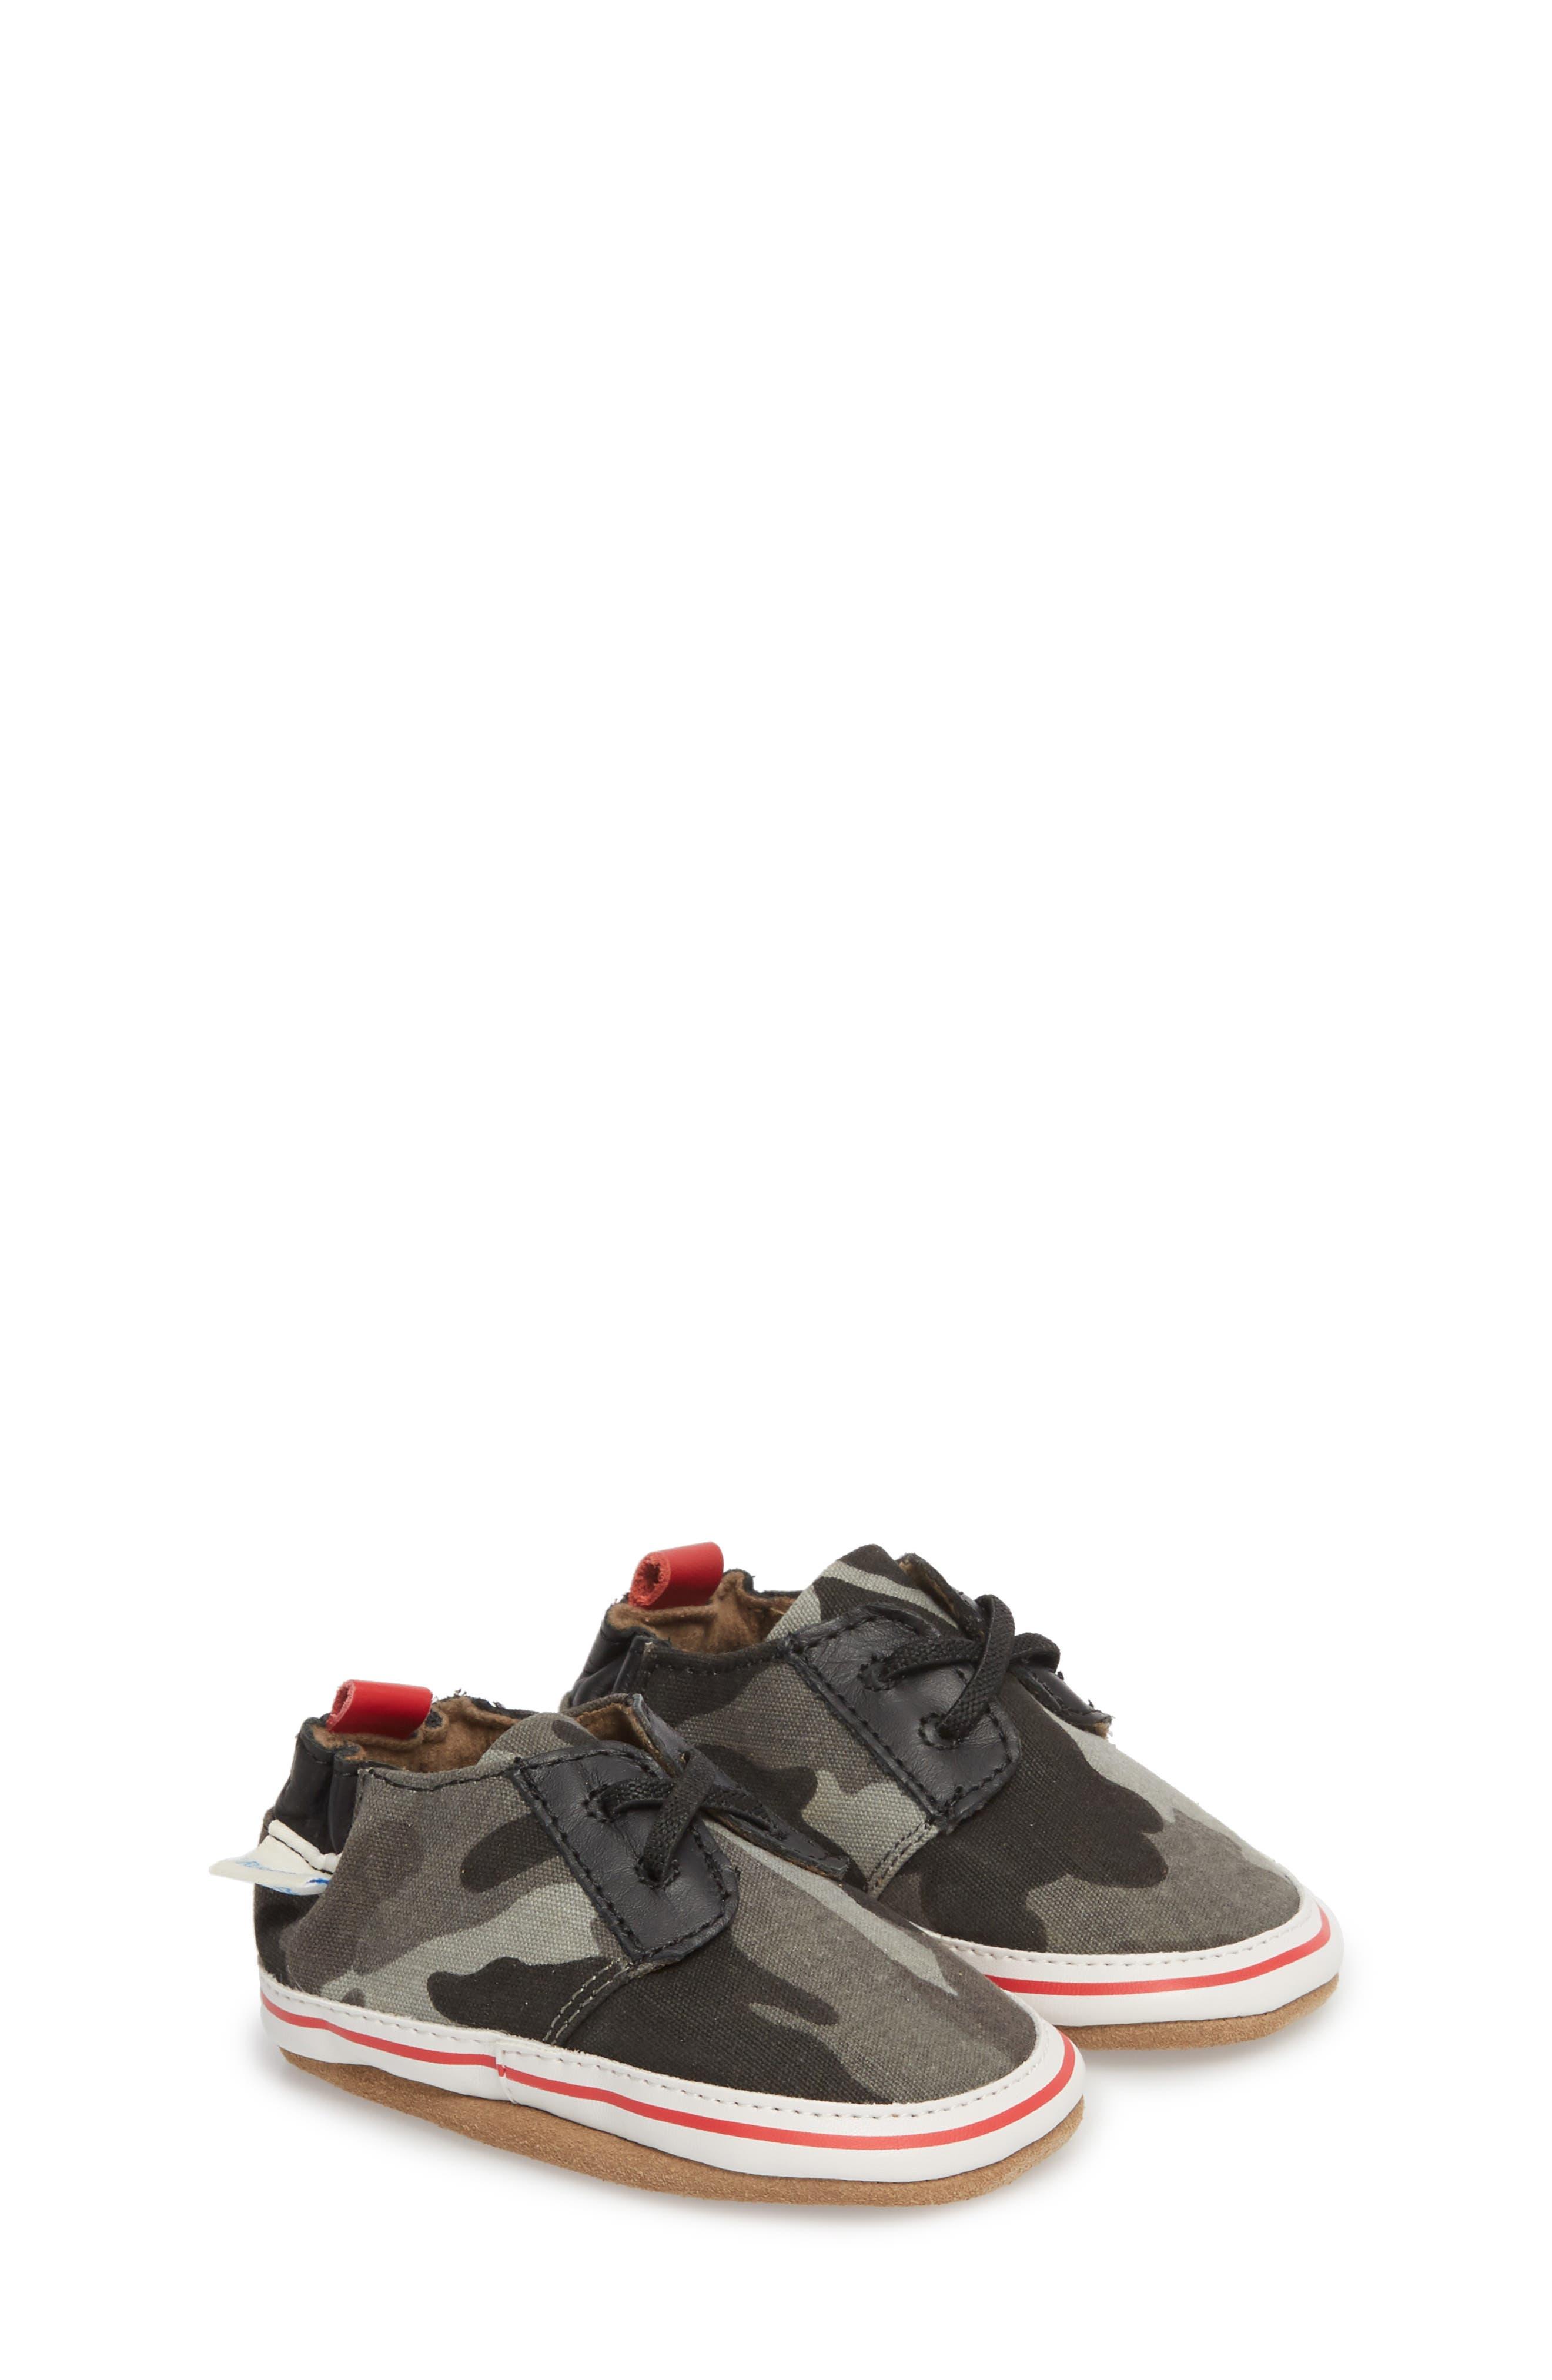 Cool & Casual Camo Print Crib Shoe,                             Main thumbnail 1, color,                             Grey